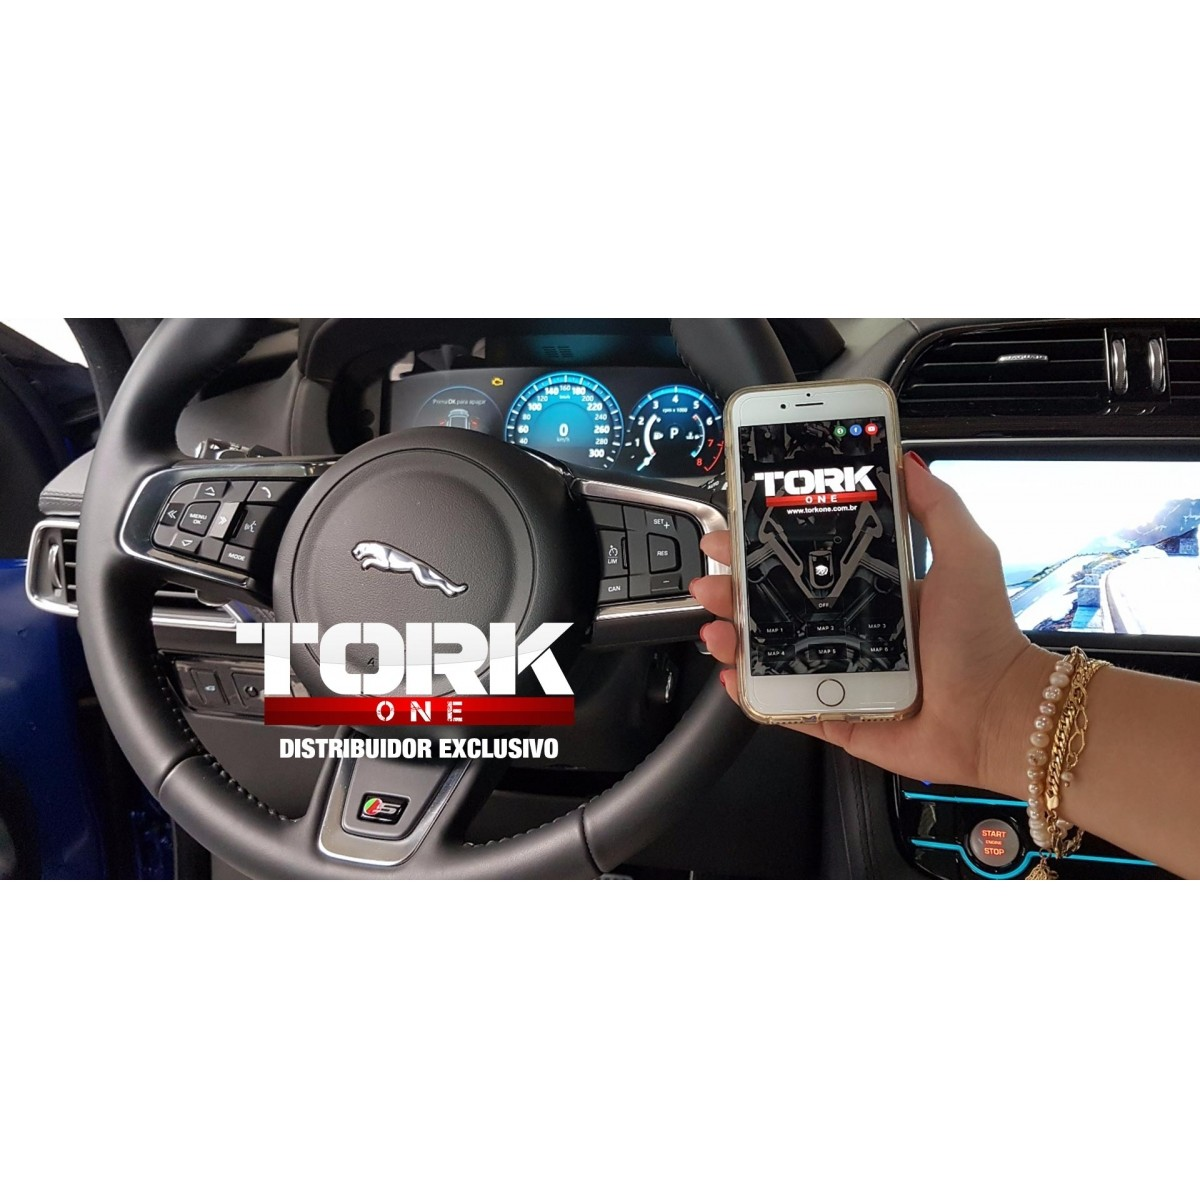 Gás Pedal - Subaru - Tork One c/s Bluetooth